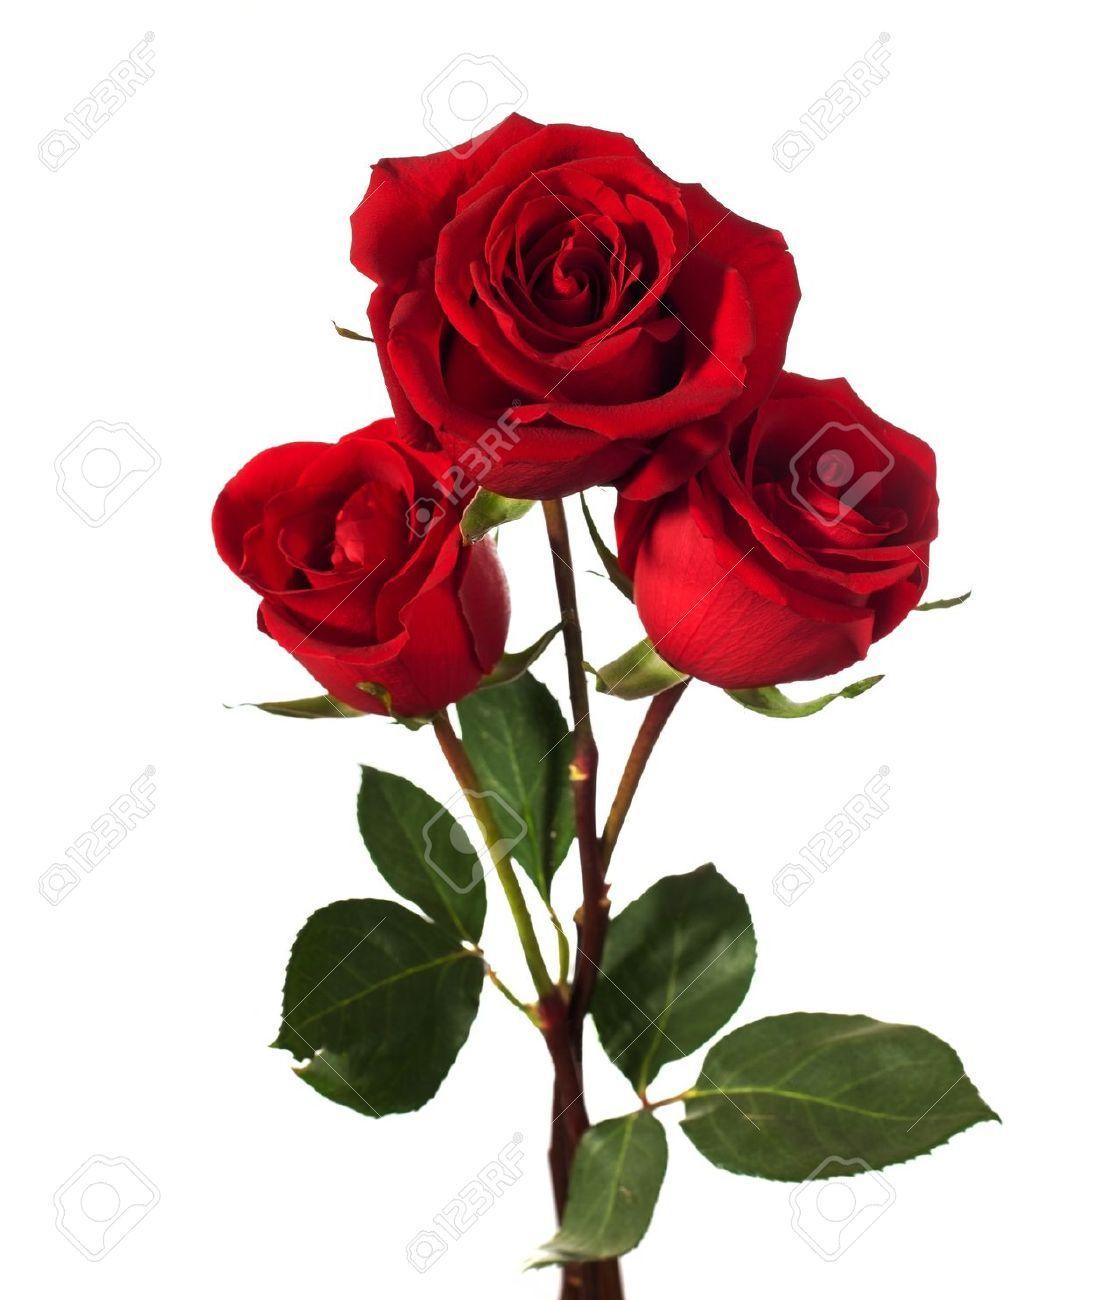 Roses Google Search Pinterest